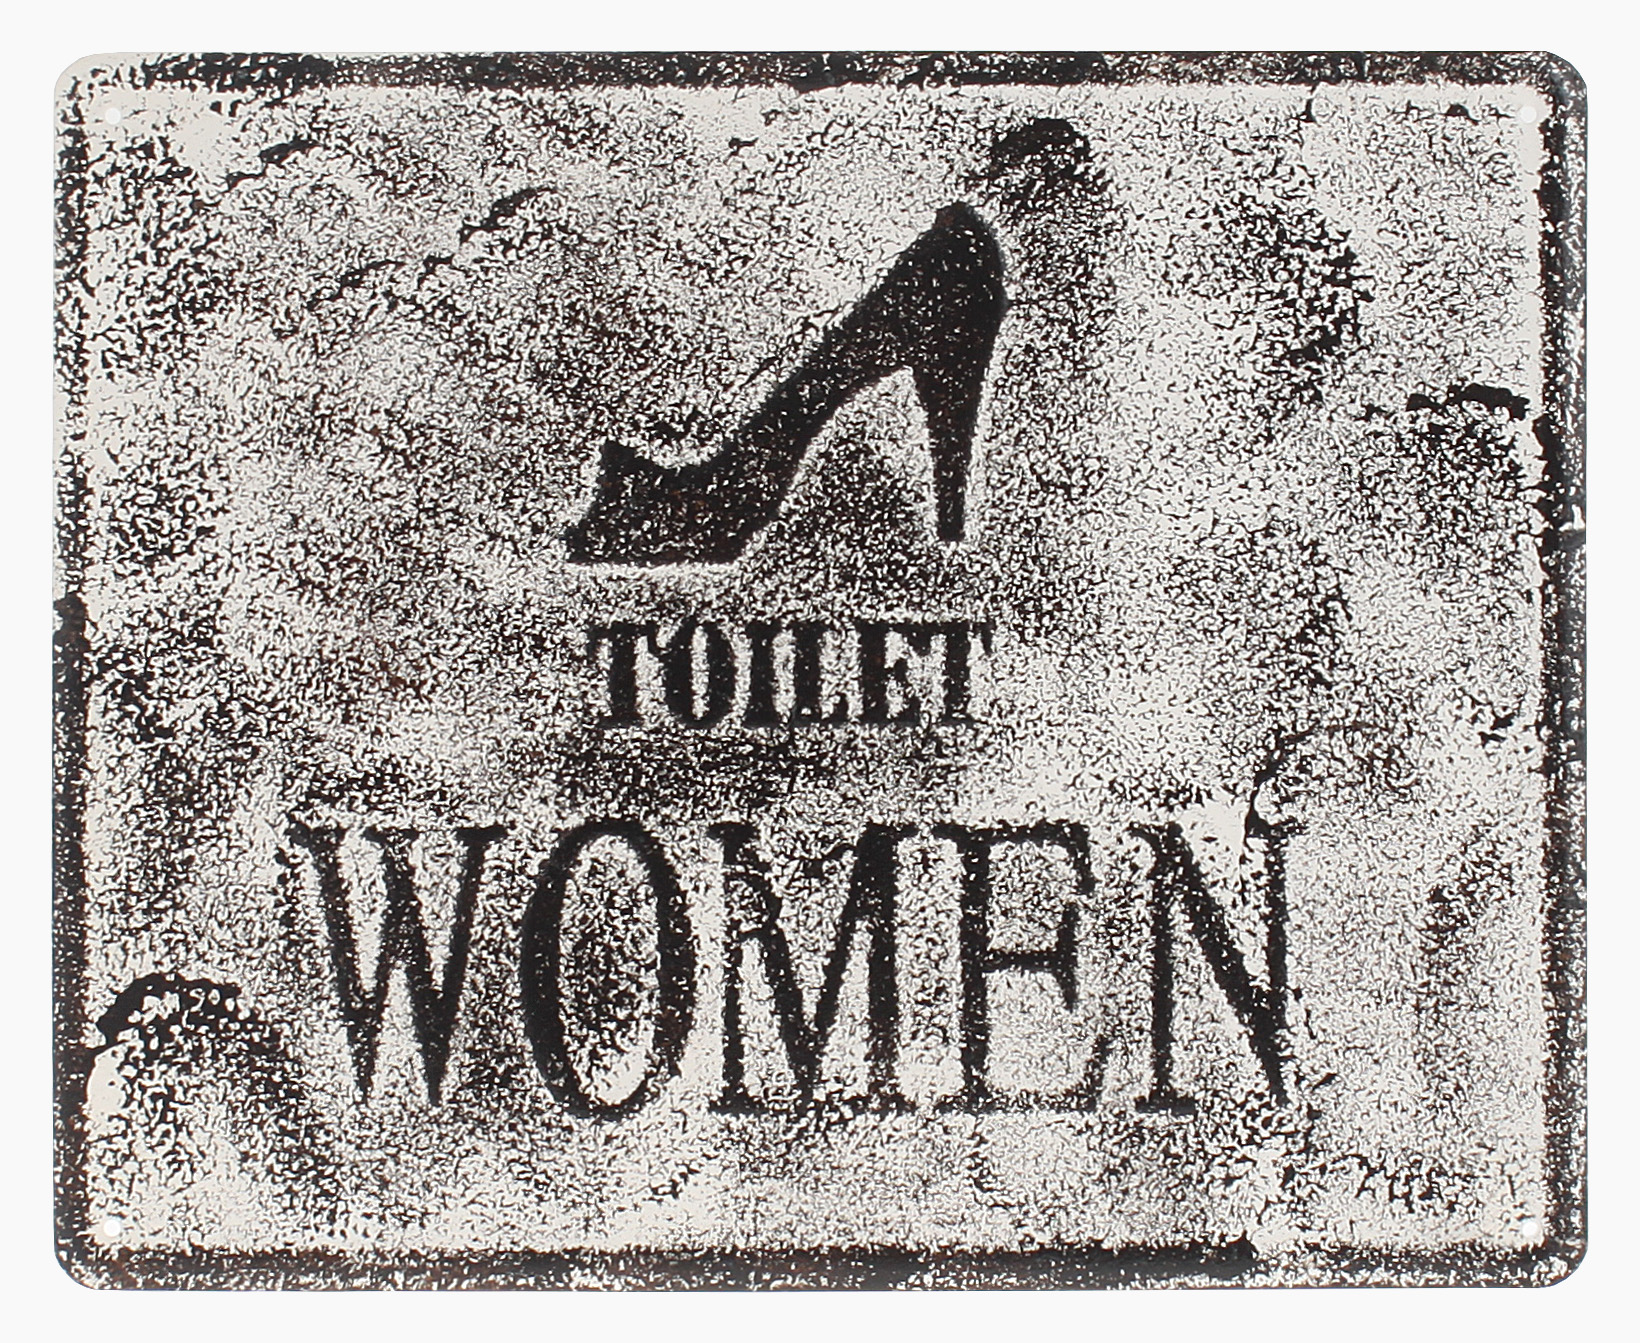 €15 METAL WALL PAINTING  'TOILET WOMEN' 25X20